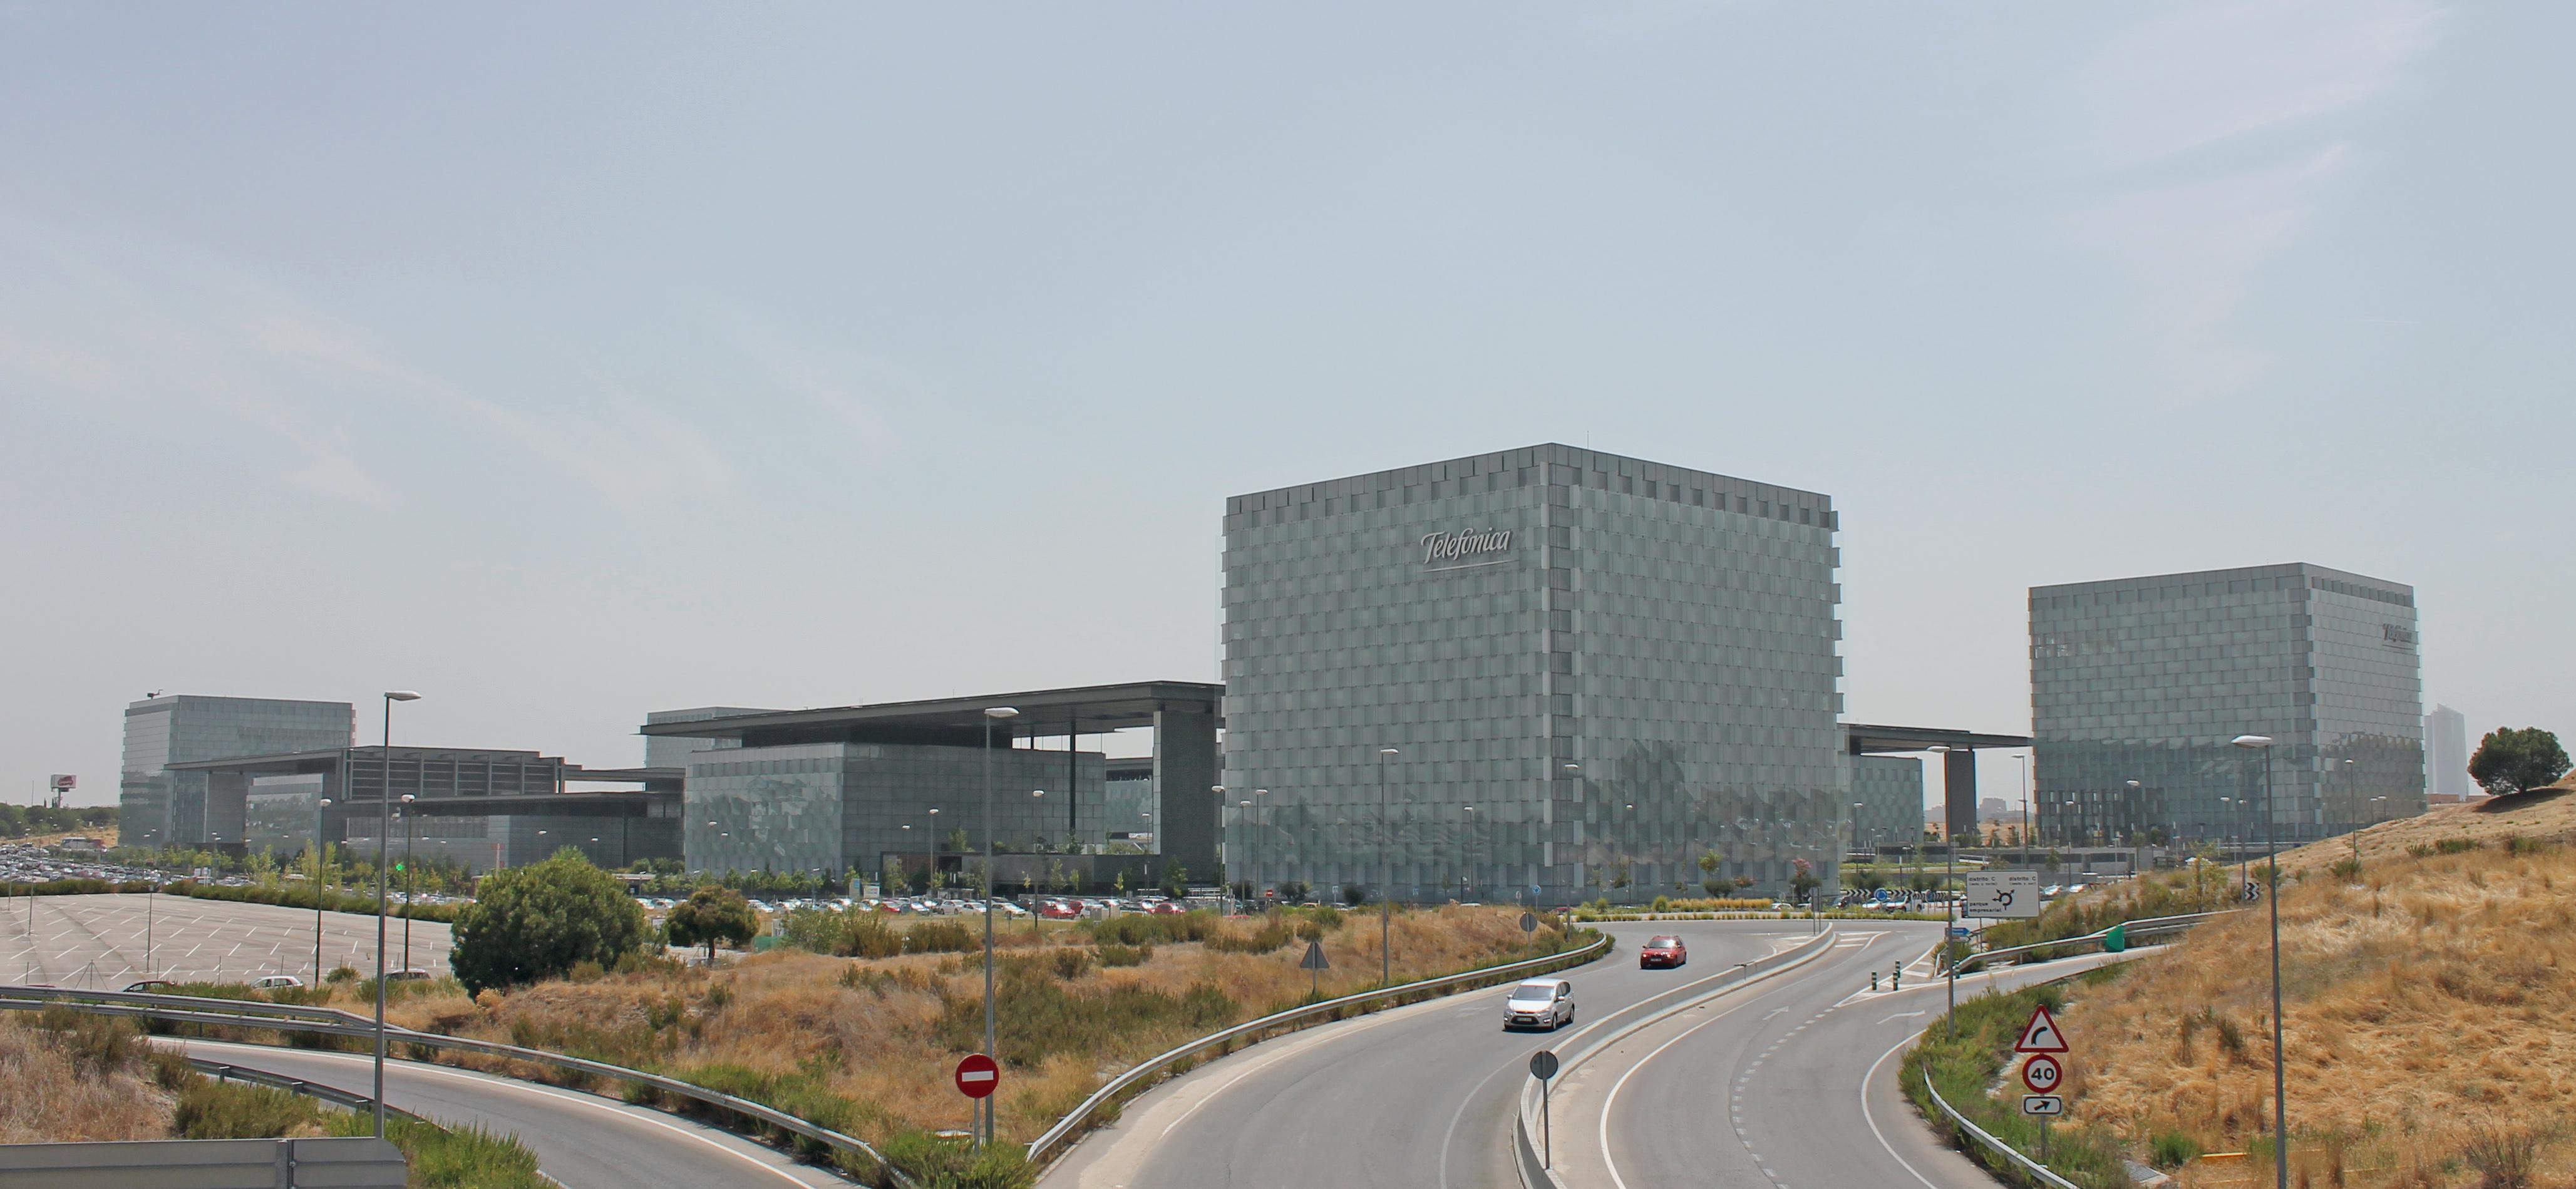 Rafael de la hoz castanys breathing architecture for Oficinas telefonica